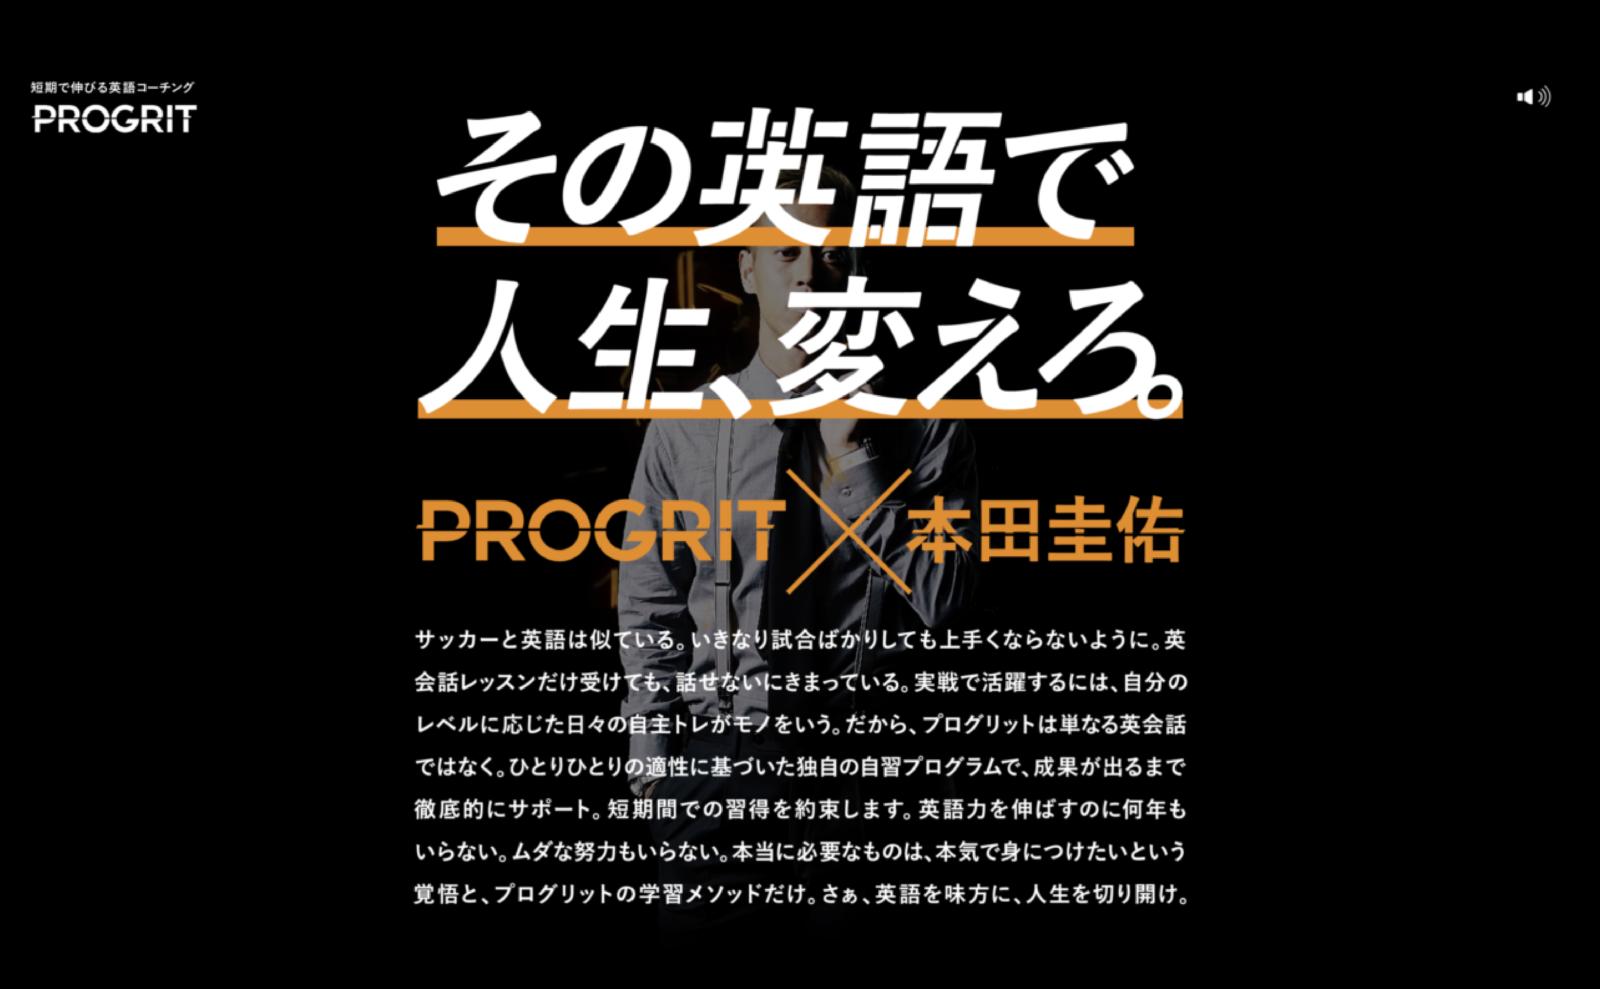 PROGRIT__-7